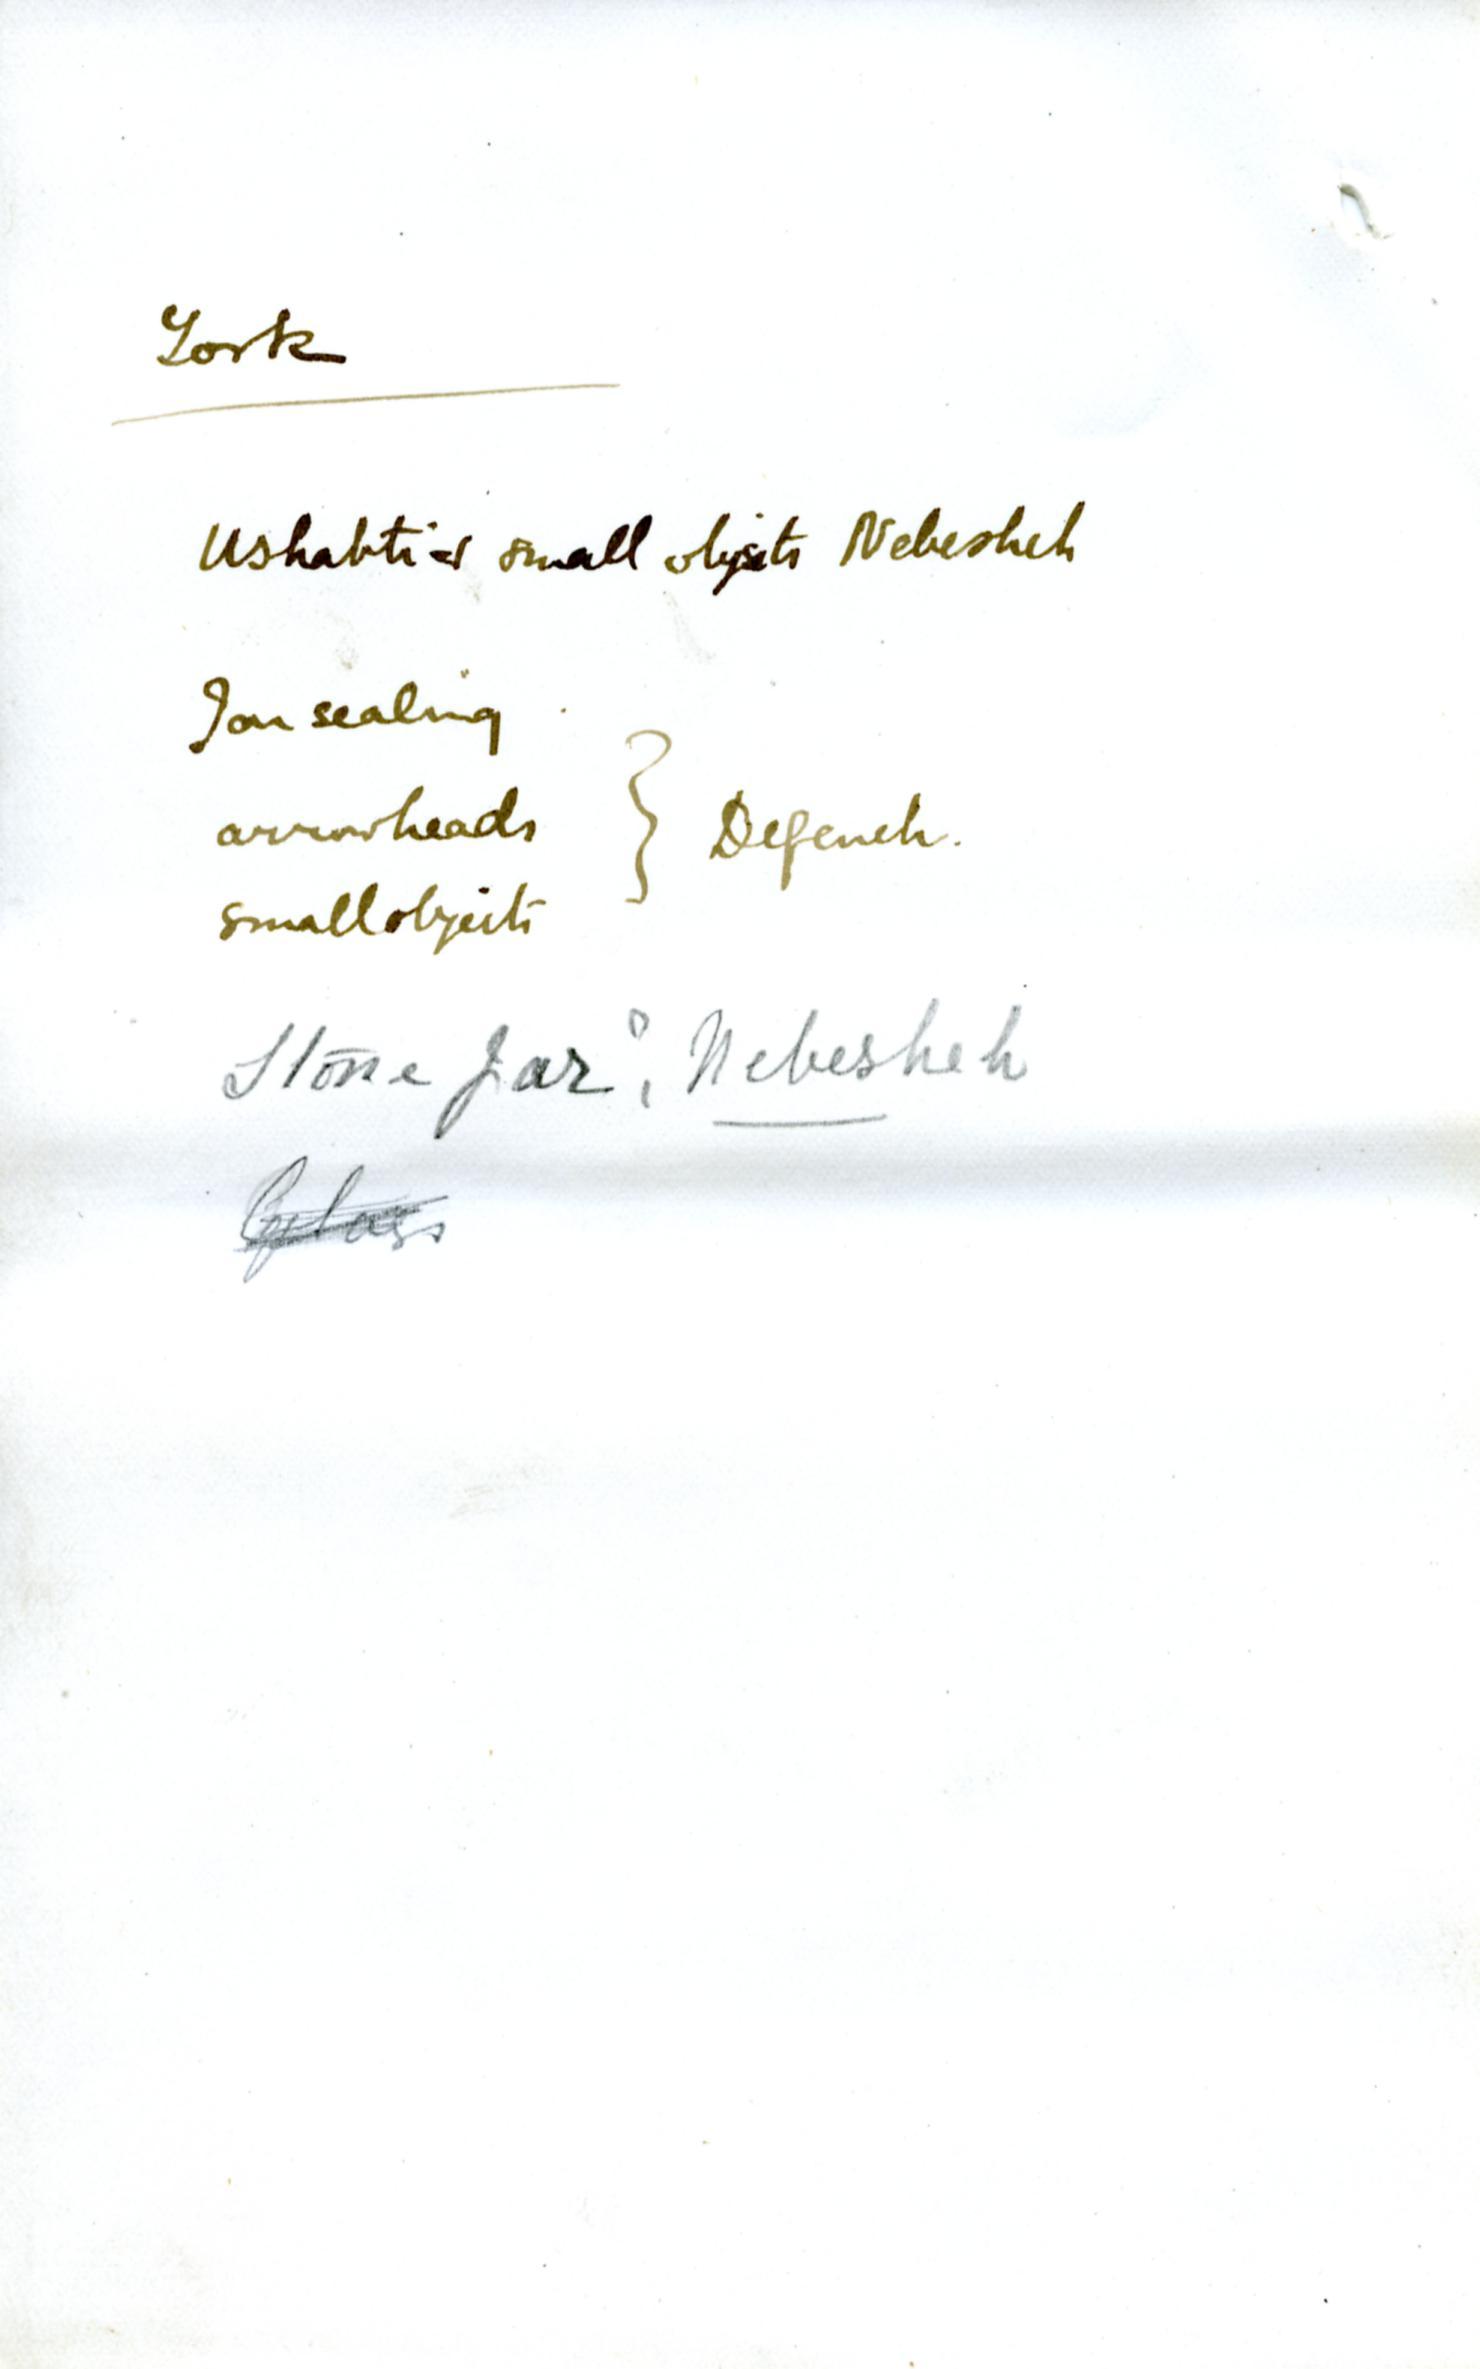 1886 Nebesheh Tell Dafana 1884 el-Qantara, Tell Gemayemi, Tell Sueilin DIST.09.09o